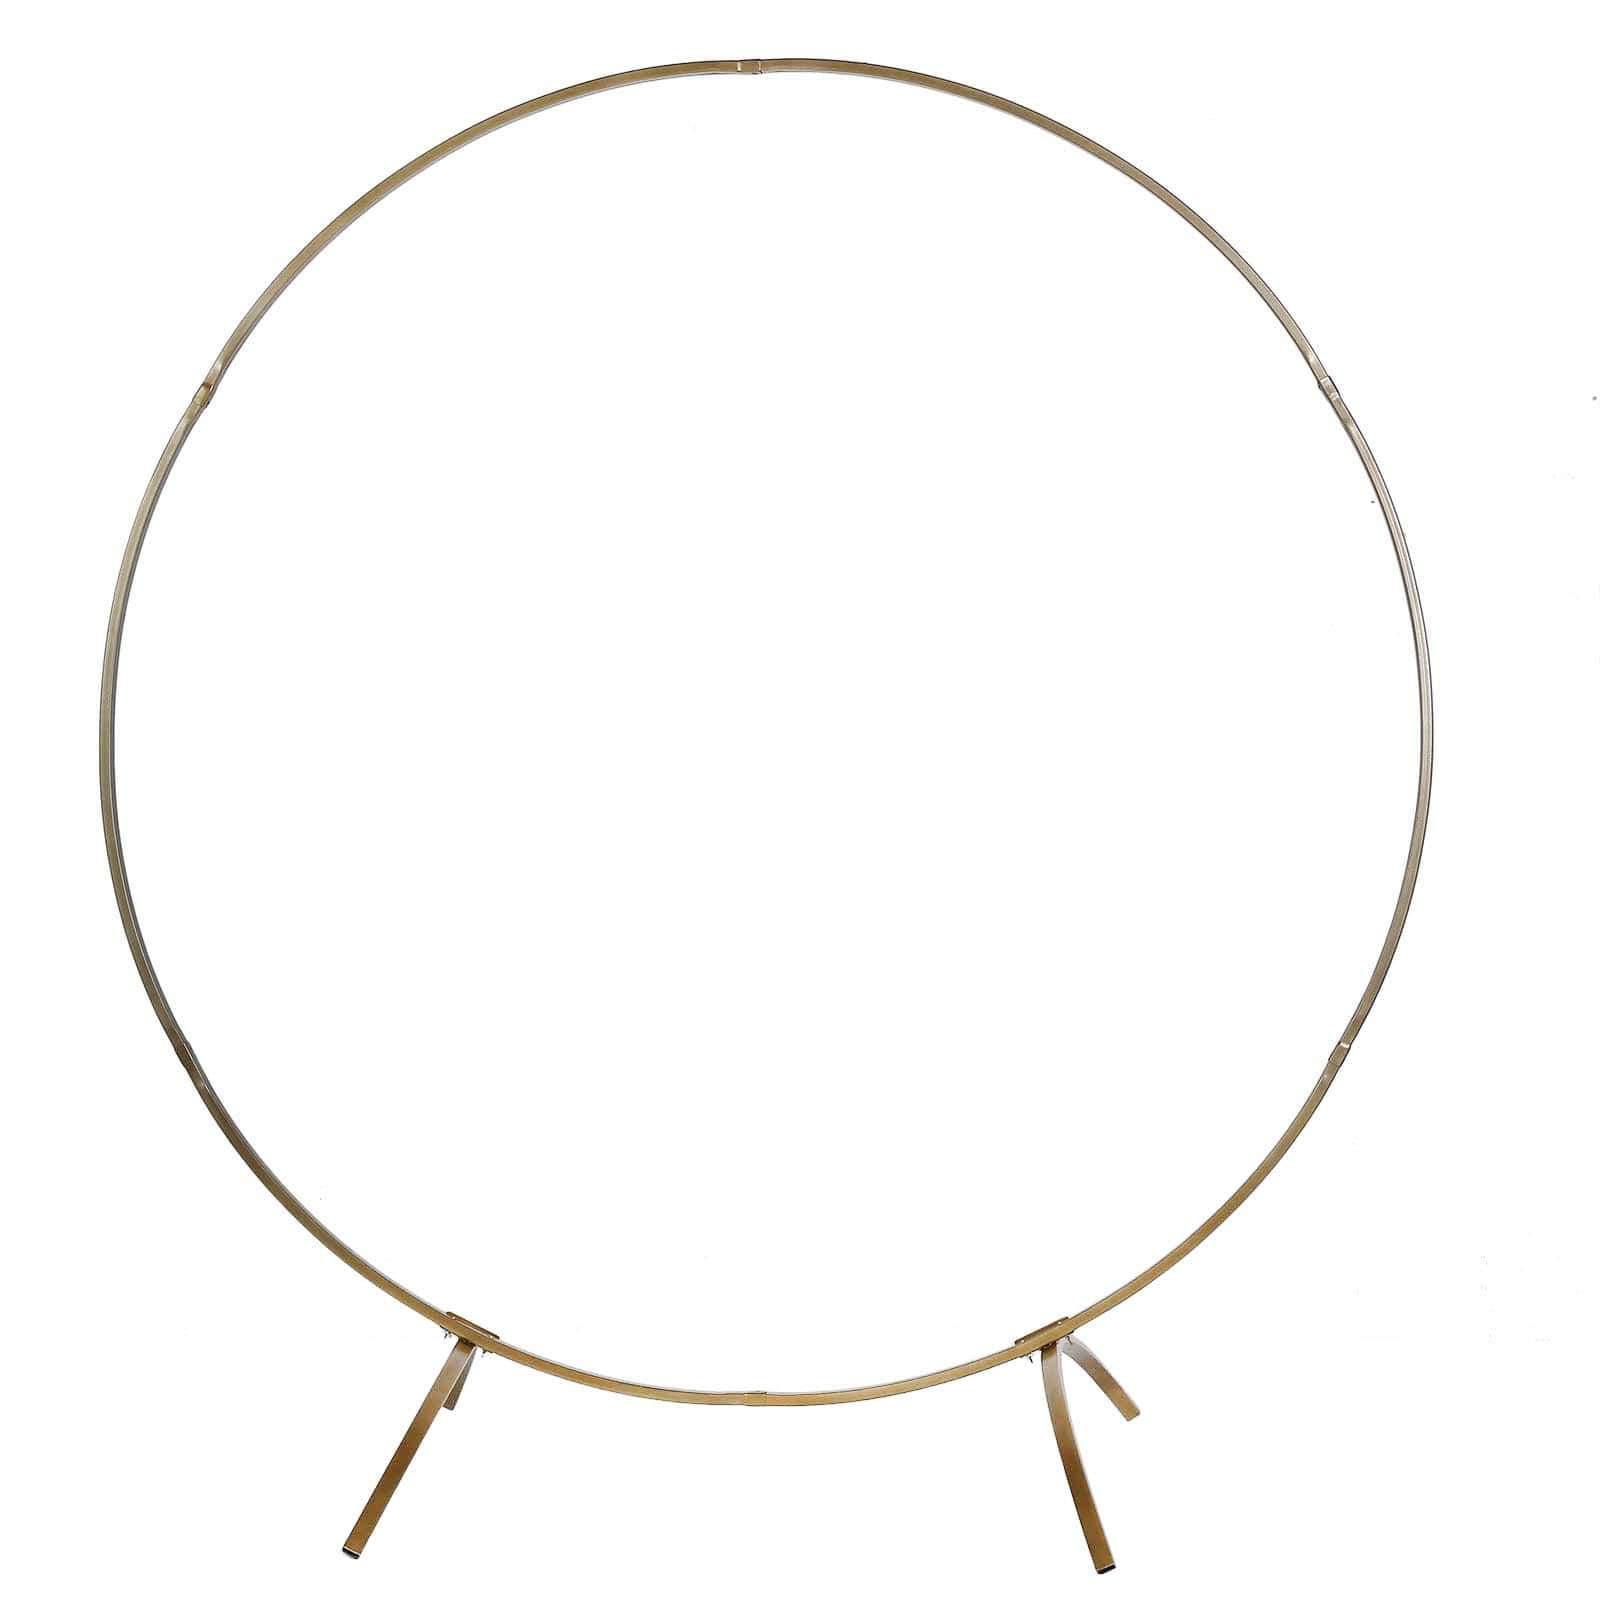 CIRCLE HOOP ARCH